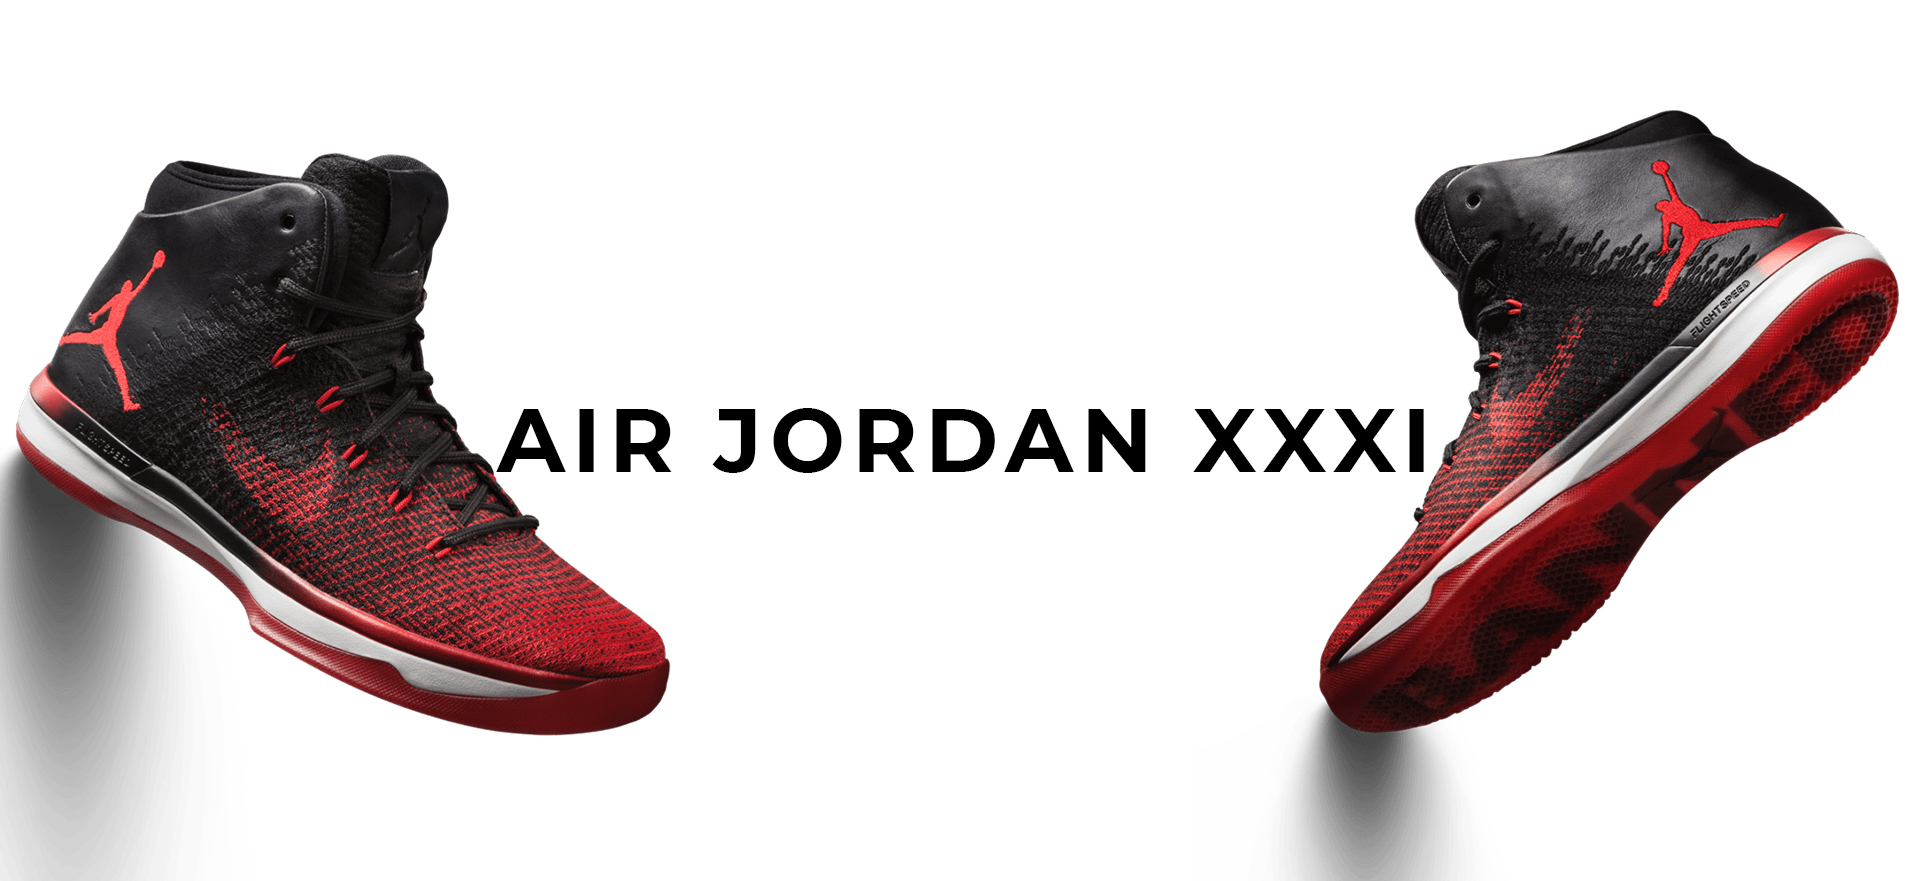 Air Jordan XXXI — mcmag.ru — все модели джордан